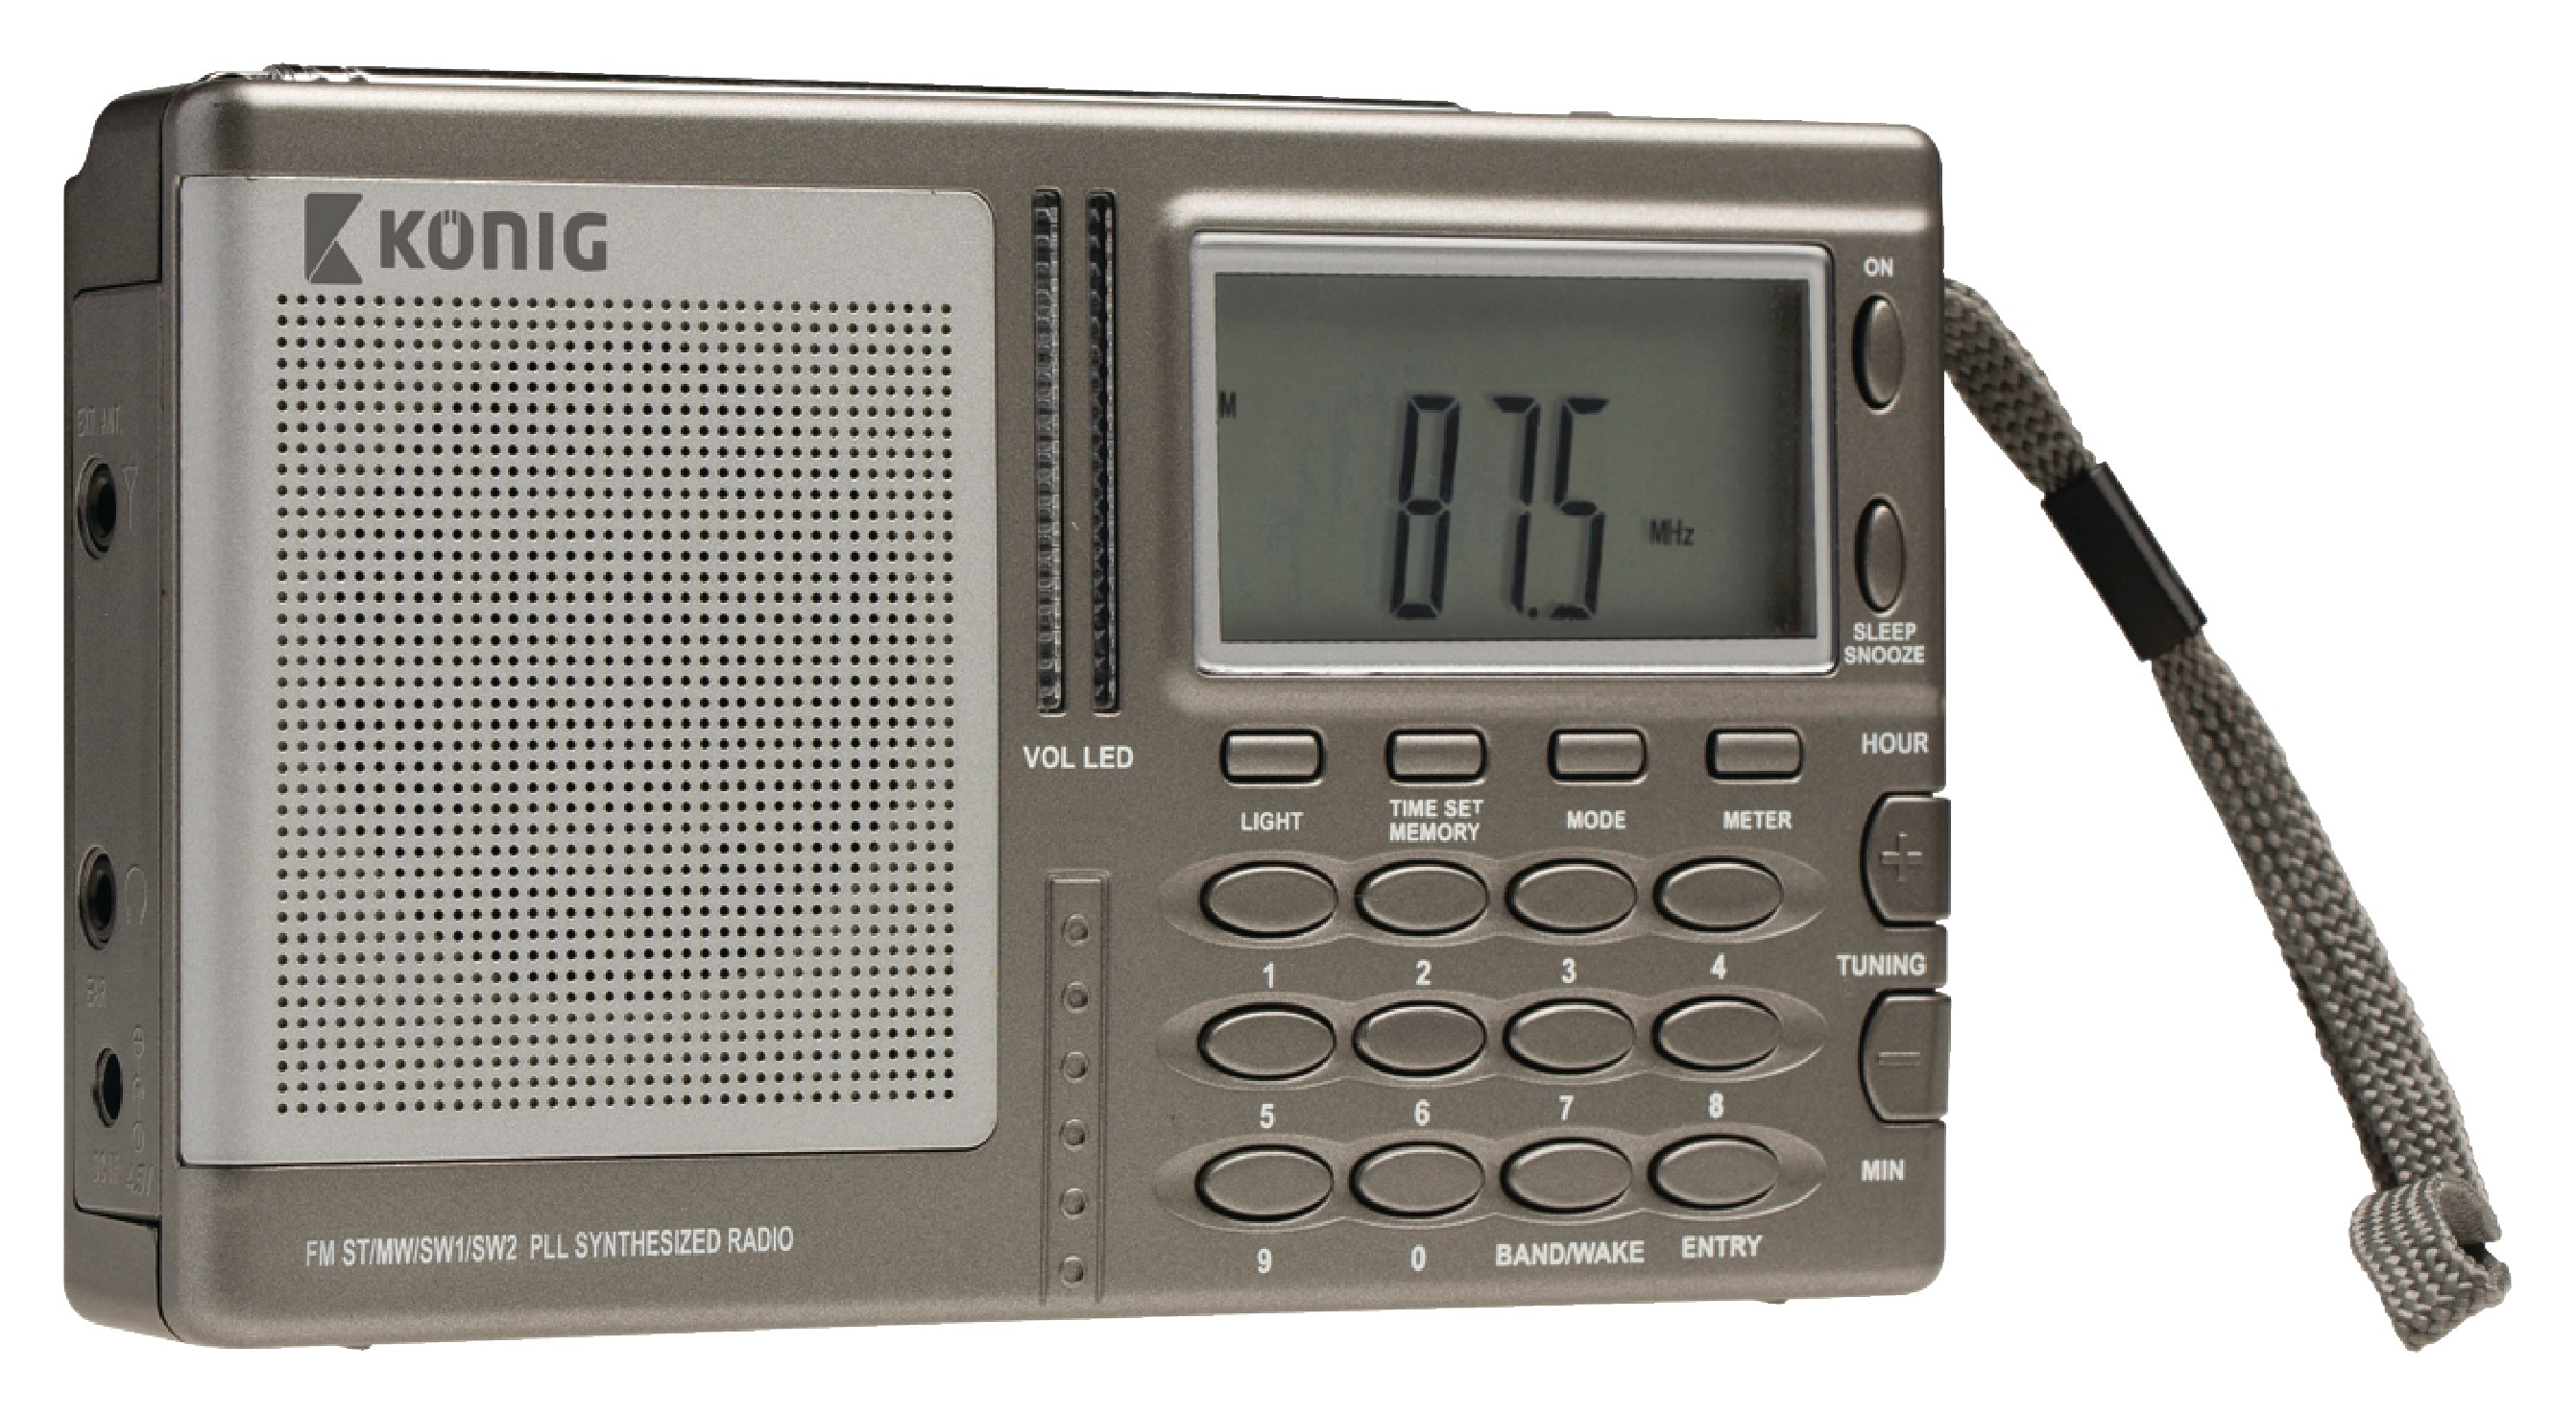 König radiopřijímač AM/FM/SW s digitálním laděním a hodinami HAV-PR31